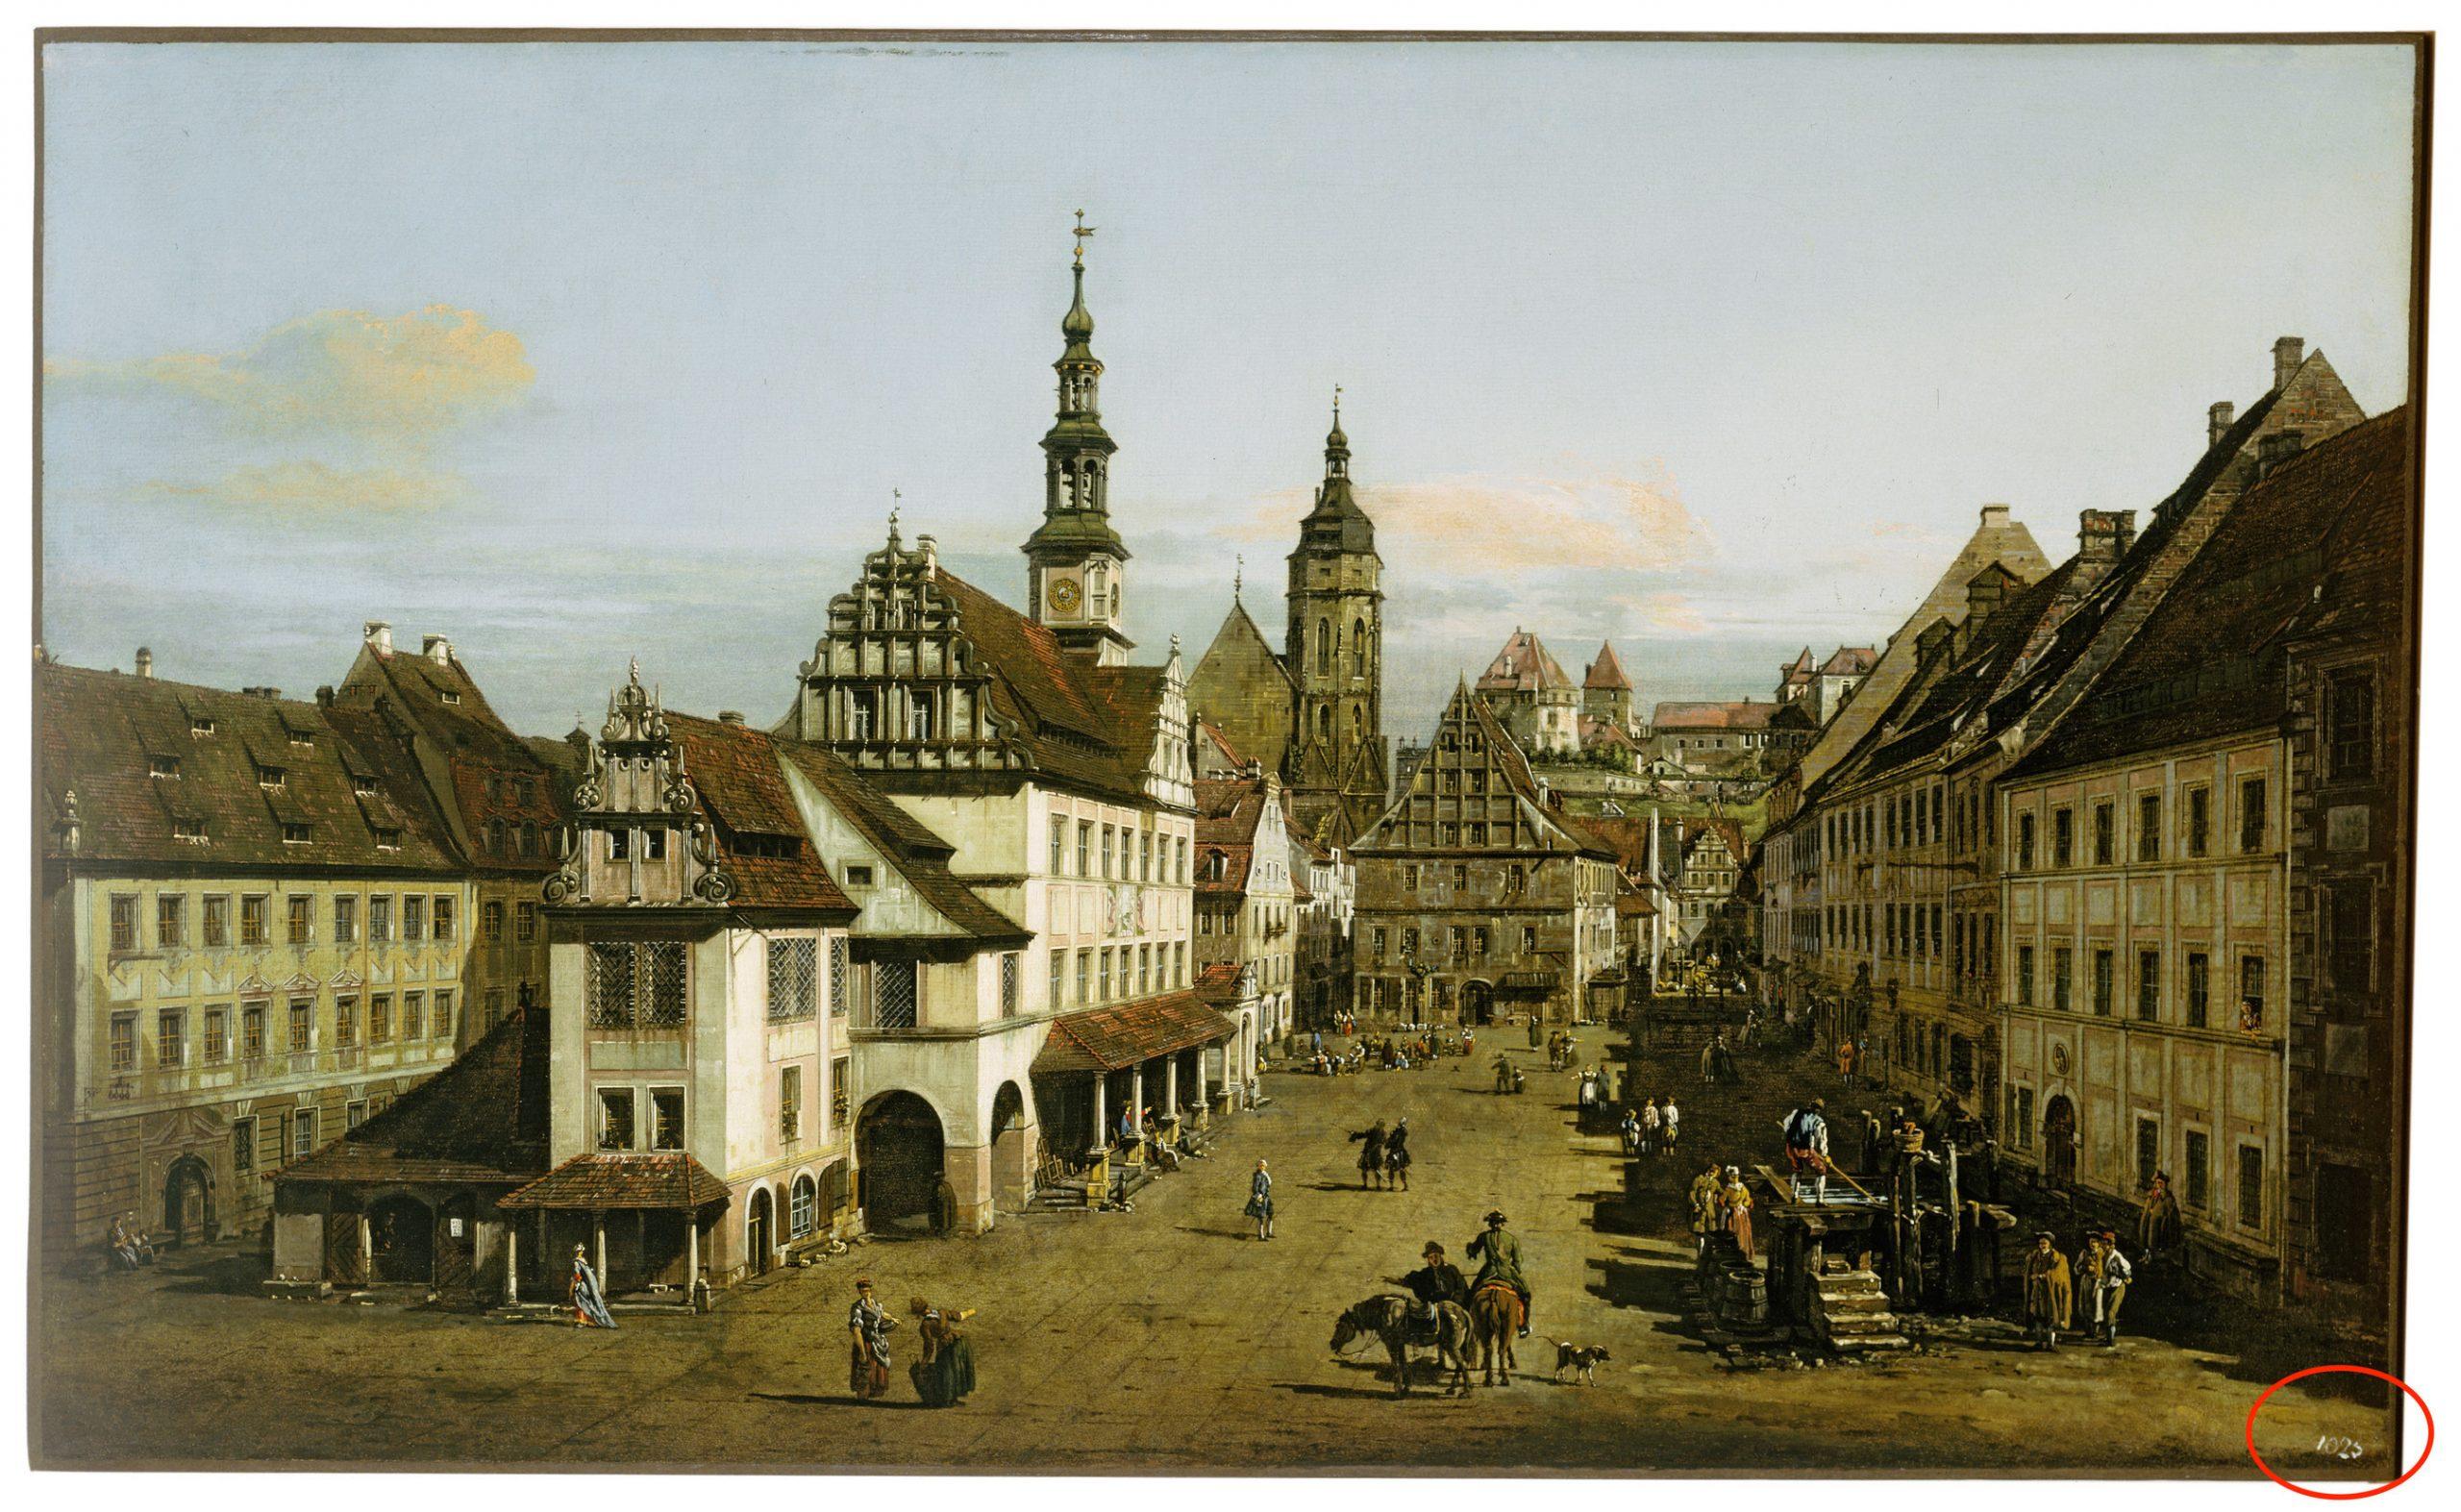 Bernardo Bellotto, The Marketplace at Pirna (c. 1764).